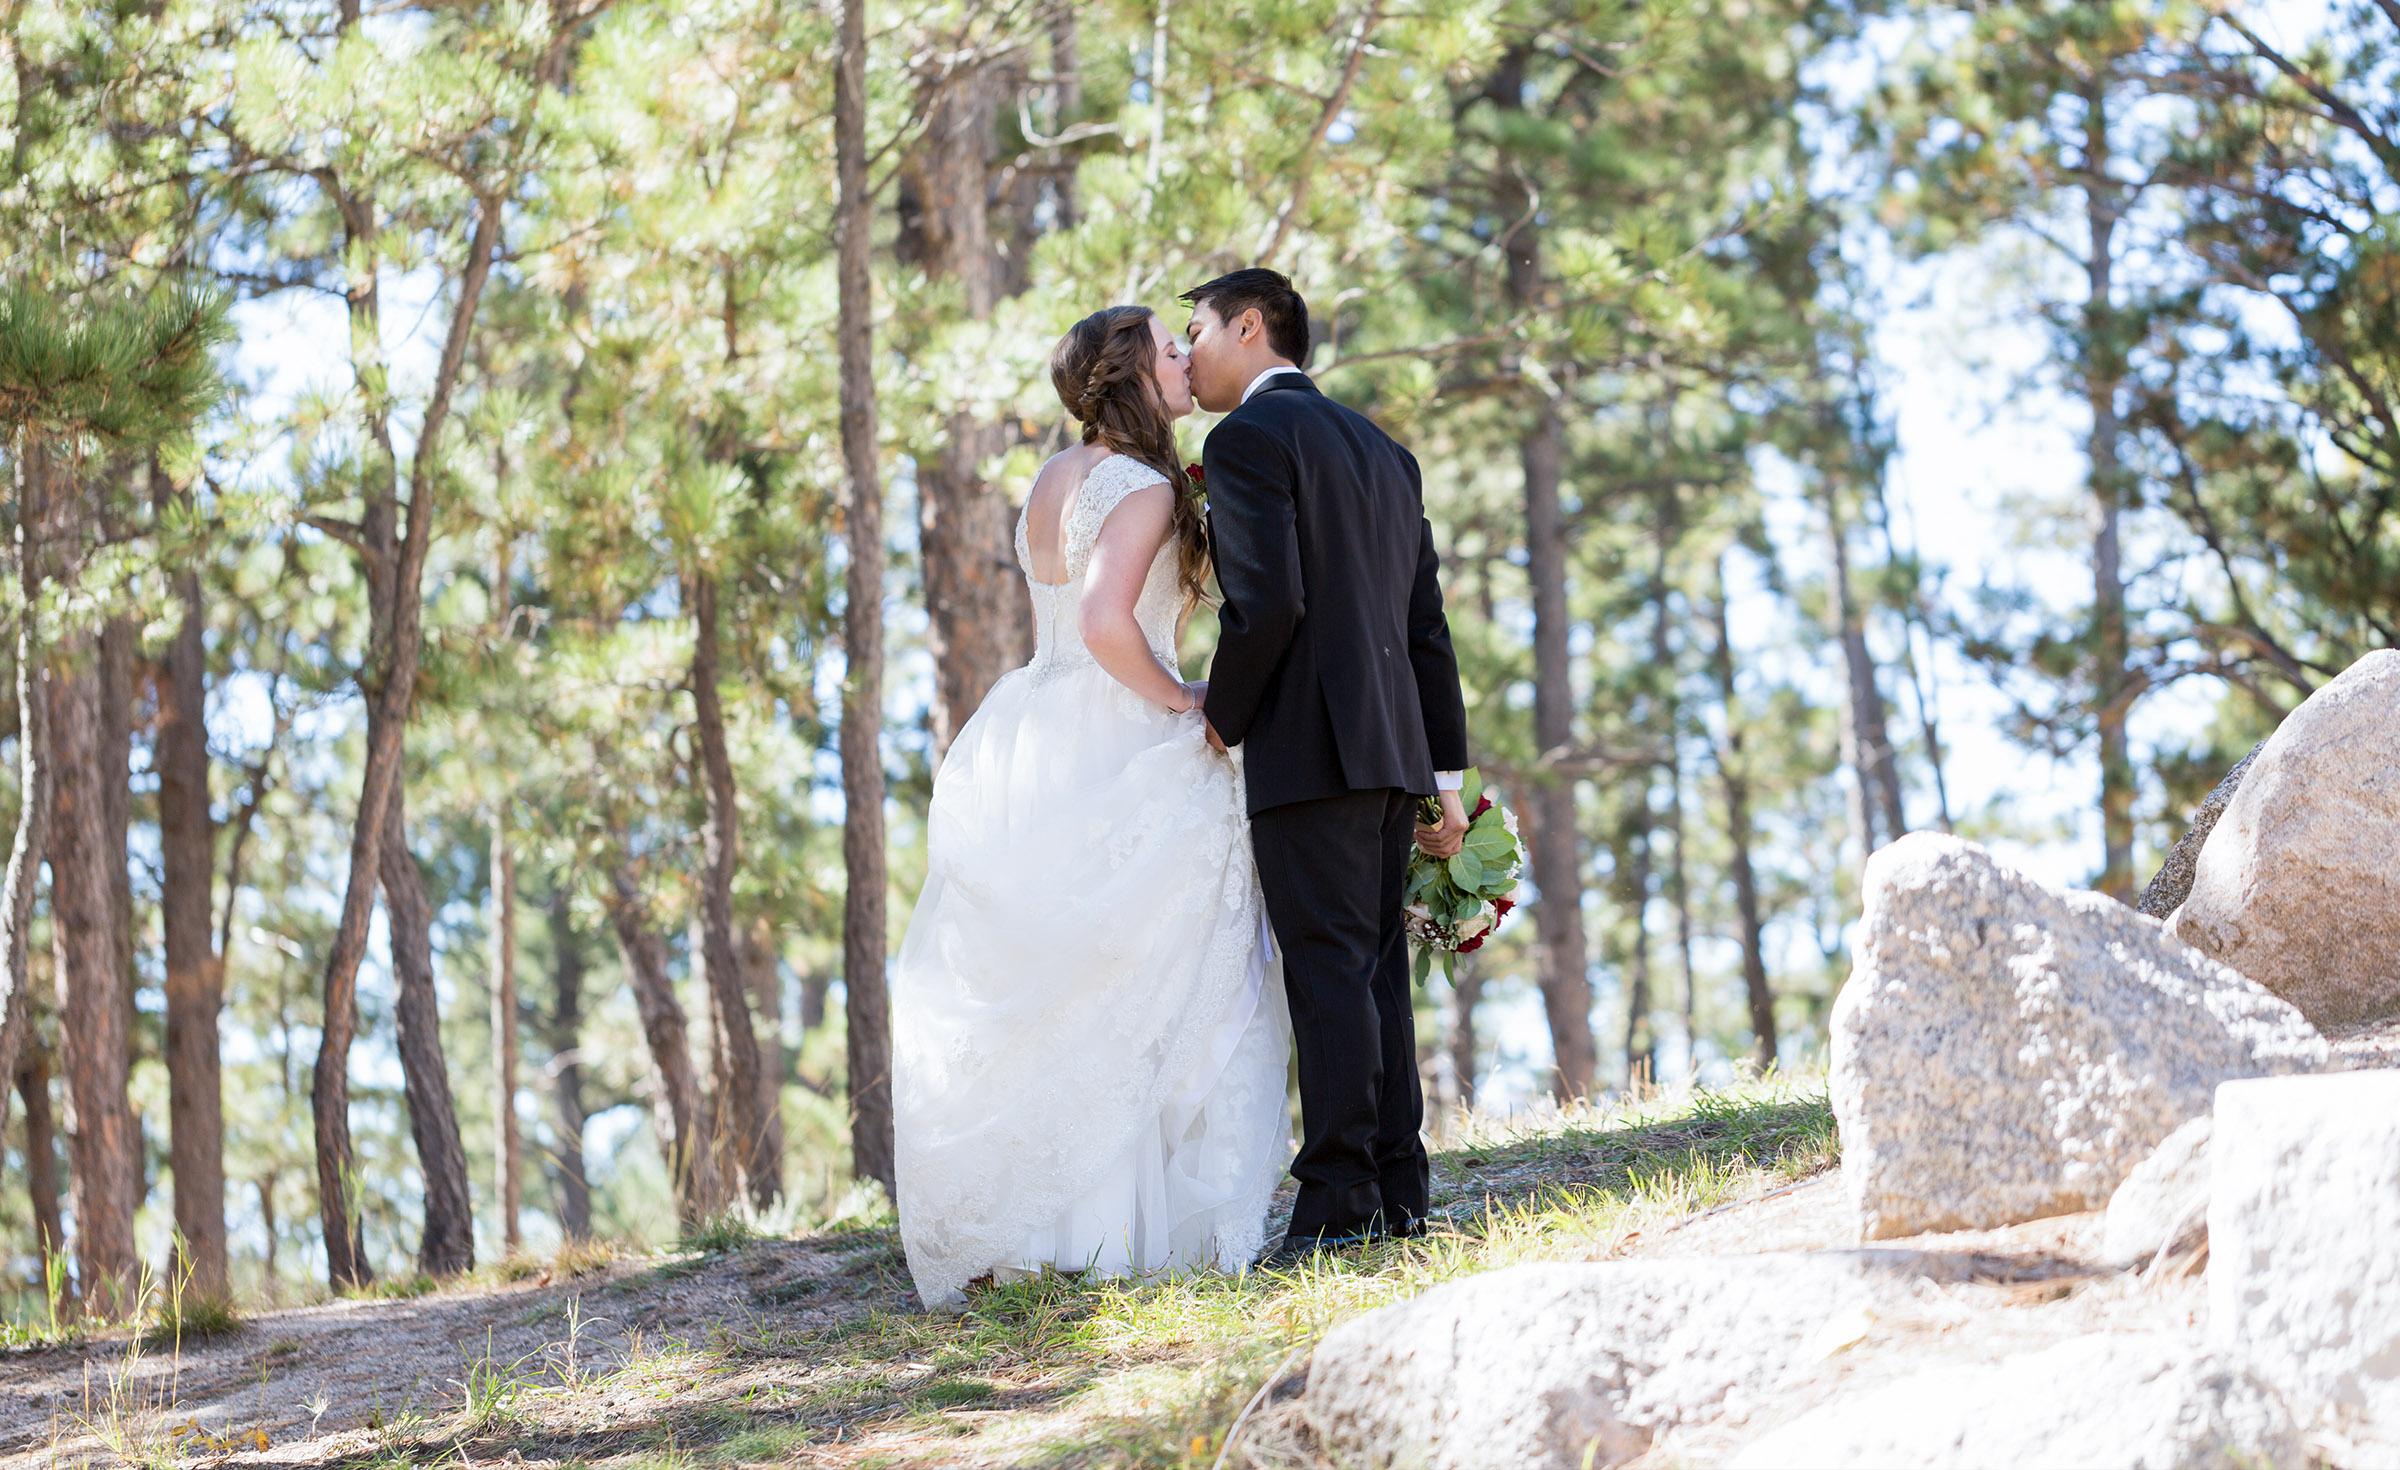 Romantic kiss in the woods - Black Forest - Colorado Springs, Colorado - El Paso County - Wedgewood Weddings